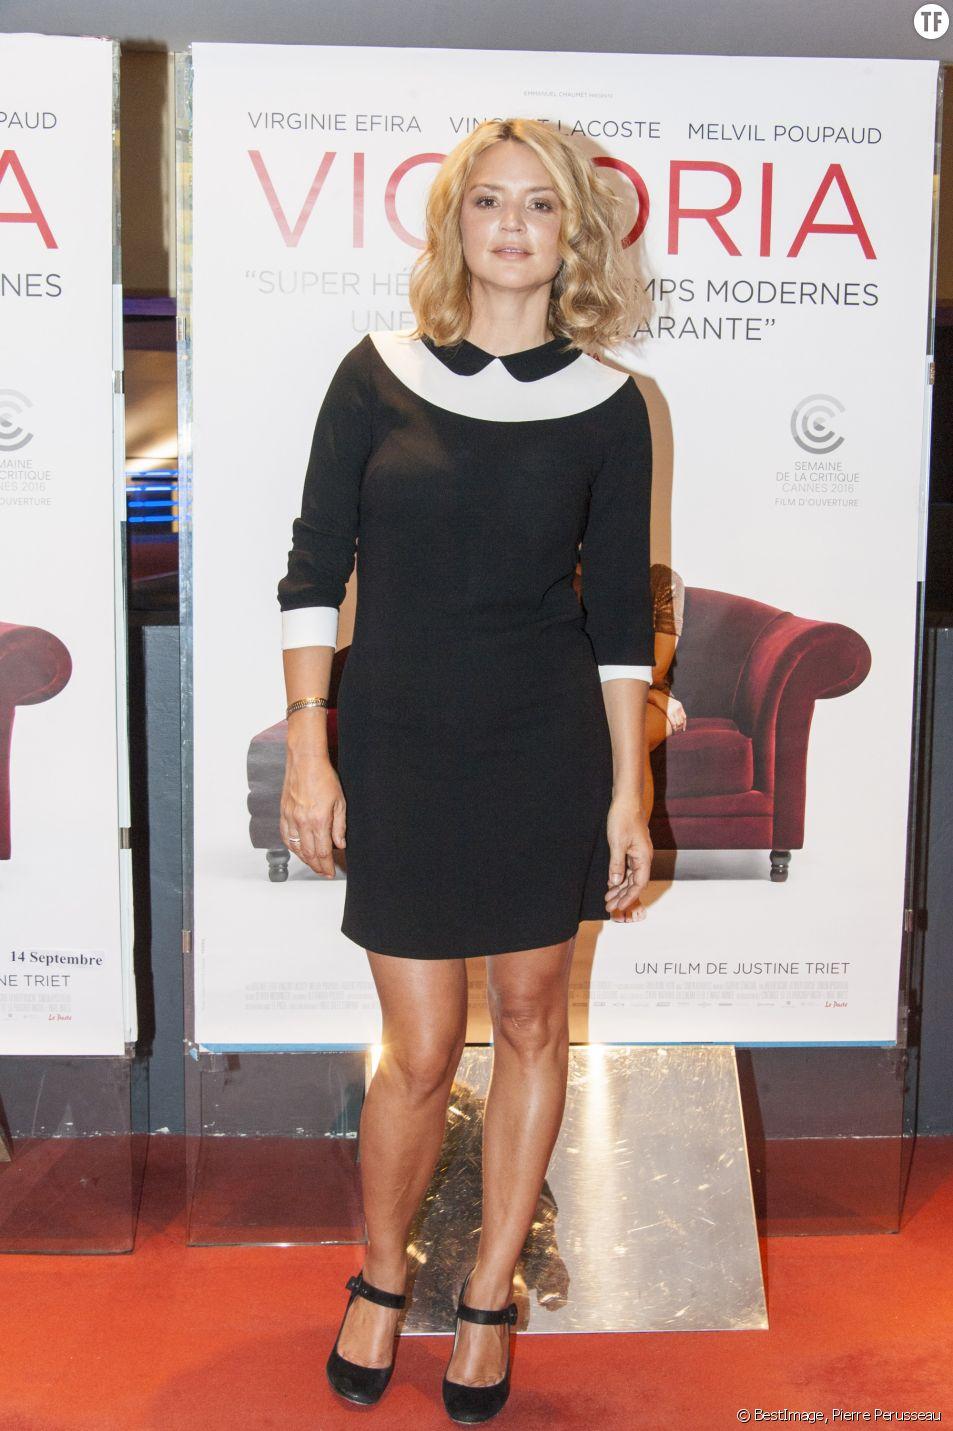 L'actrice Virginie Efira